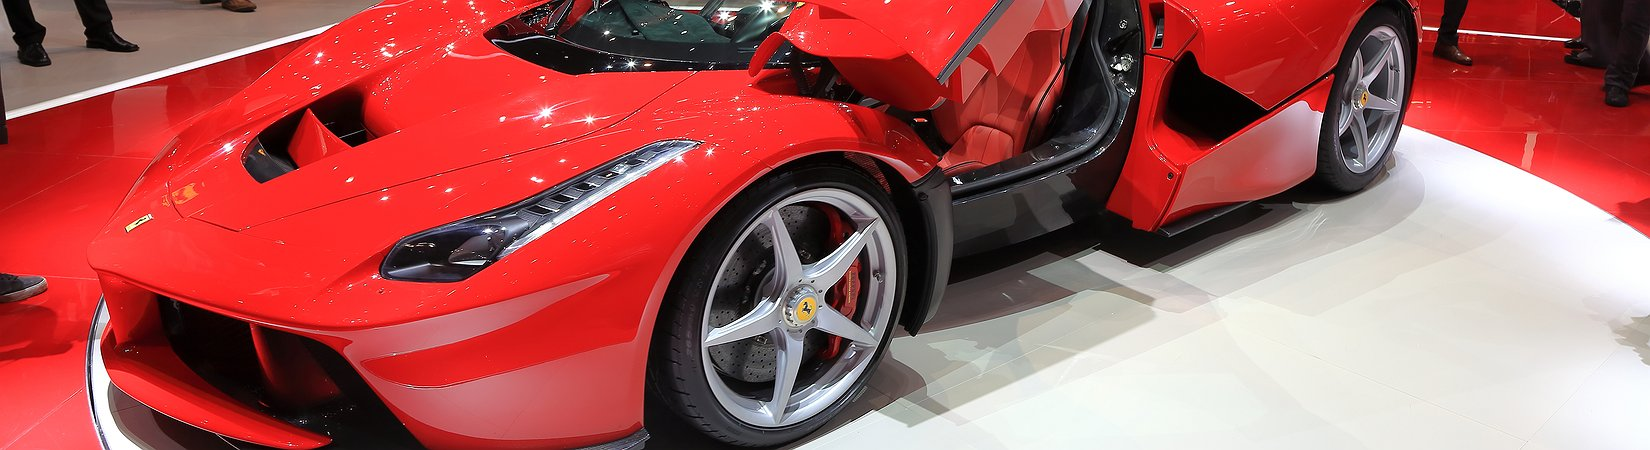 Ferrari догоняет Apple по рентабельности